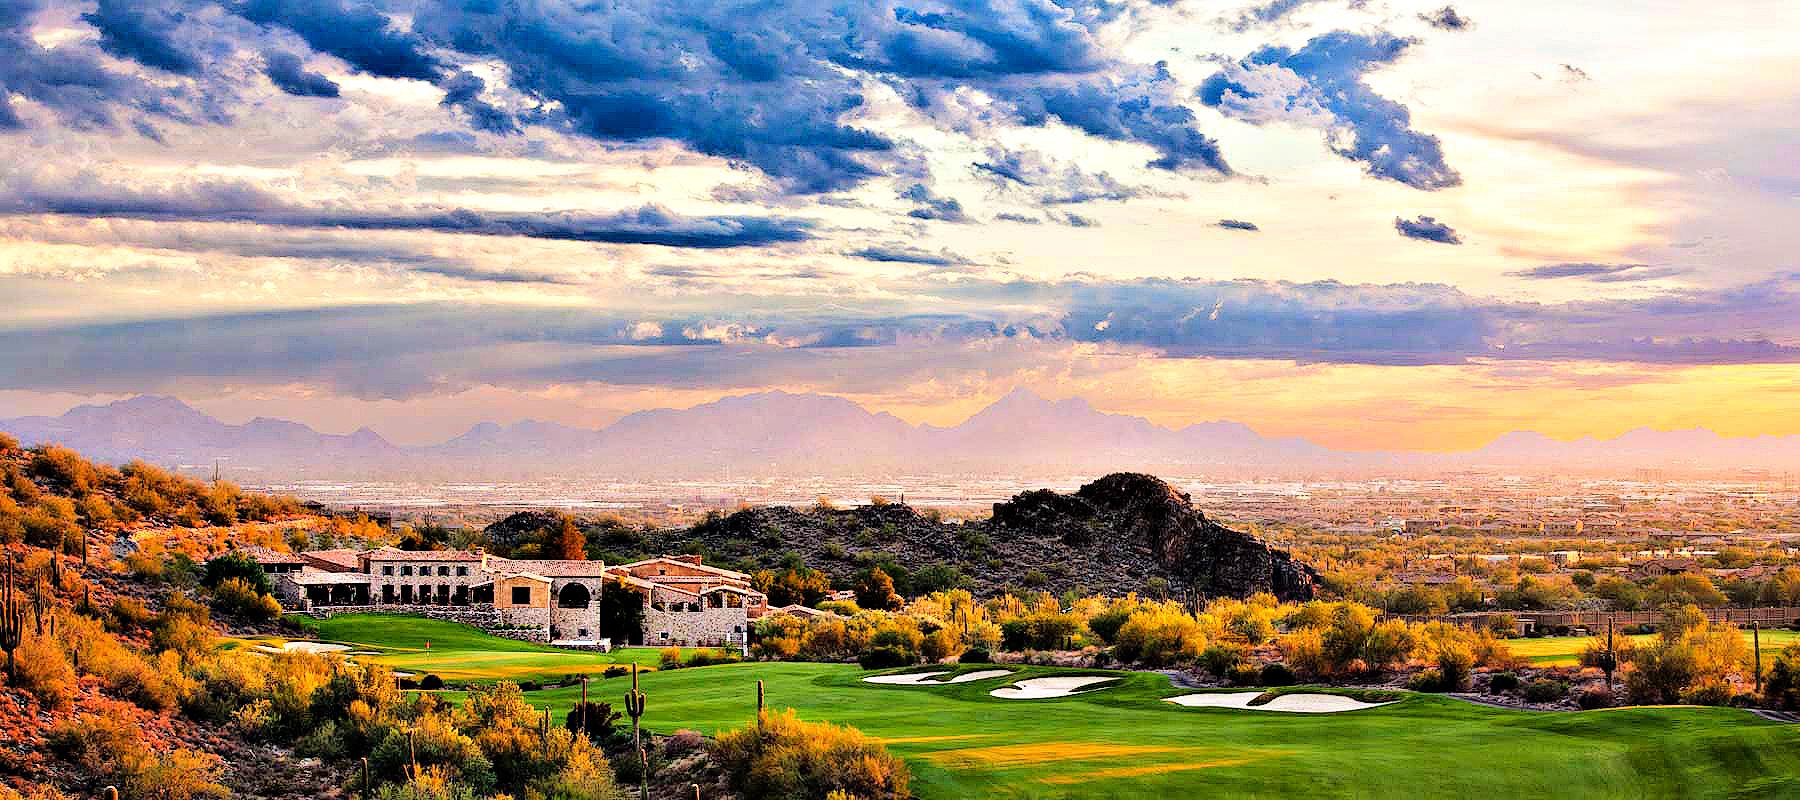 A hilltop view of homes in Silverleaf in Scottsdale AZ